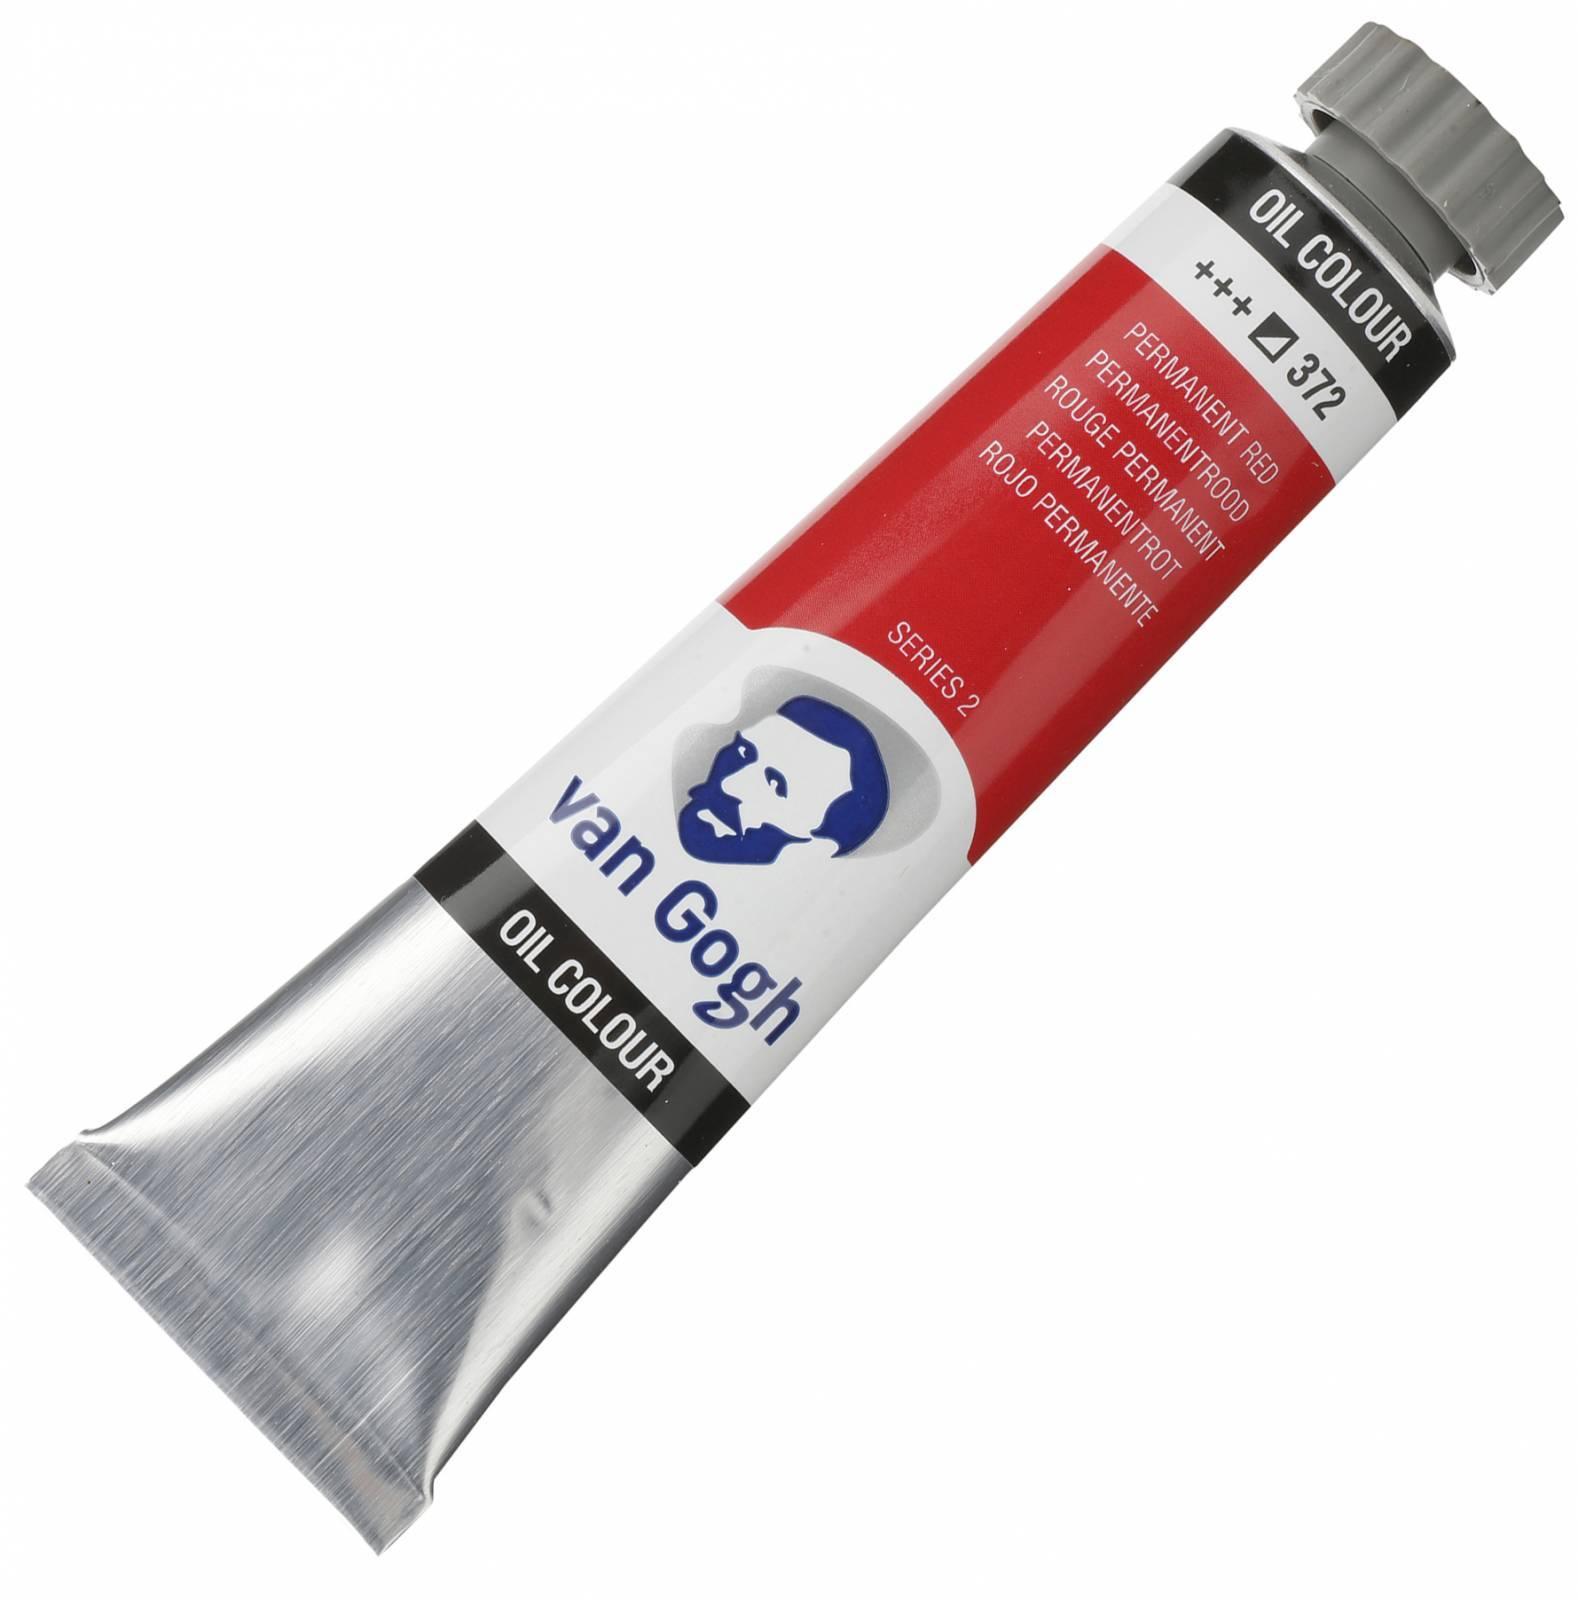 Oleo Van Gogh Permanent red +++372 - serie 2 - Tubo 20mll - Papelaria Botafogo